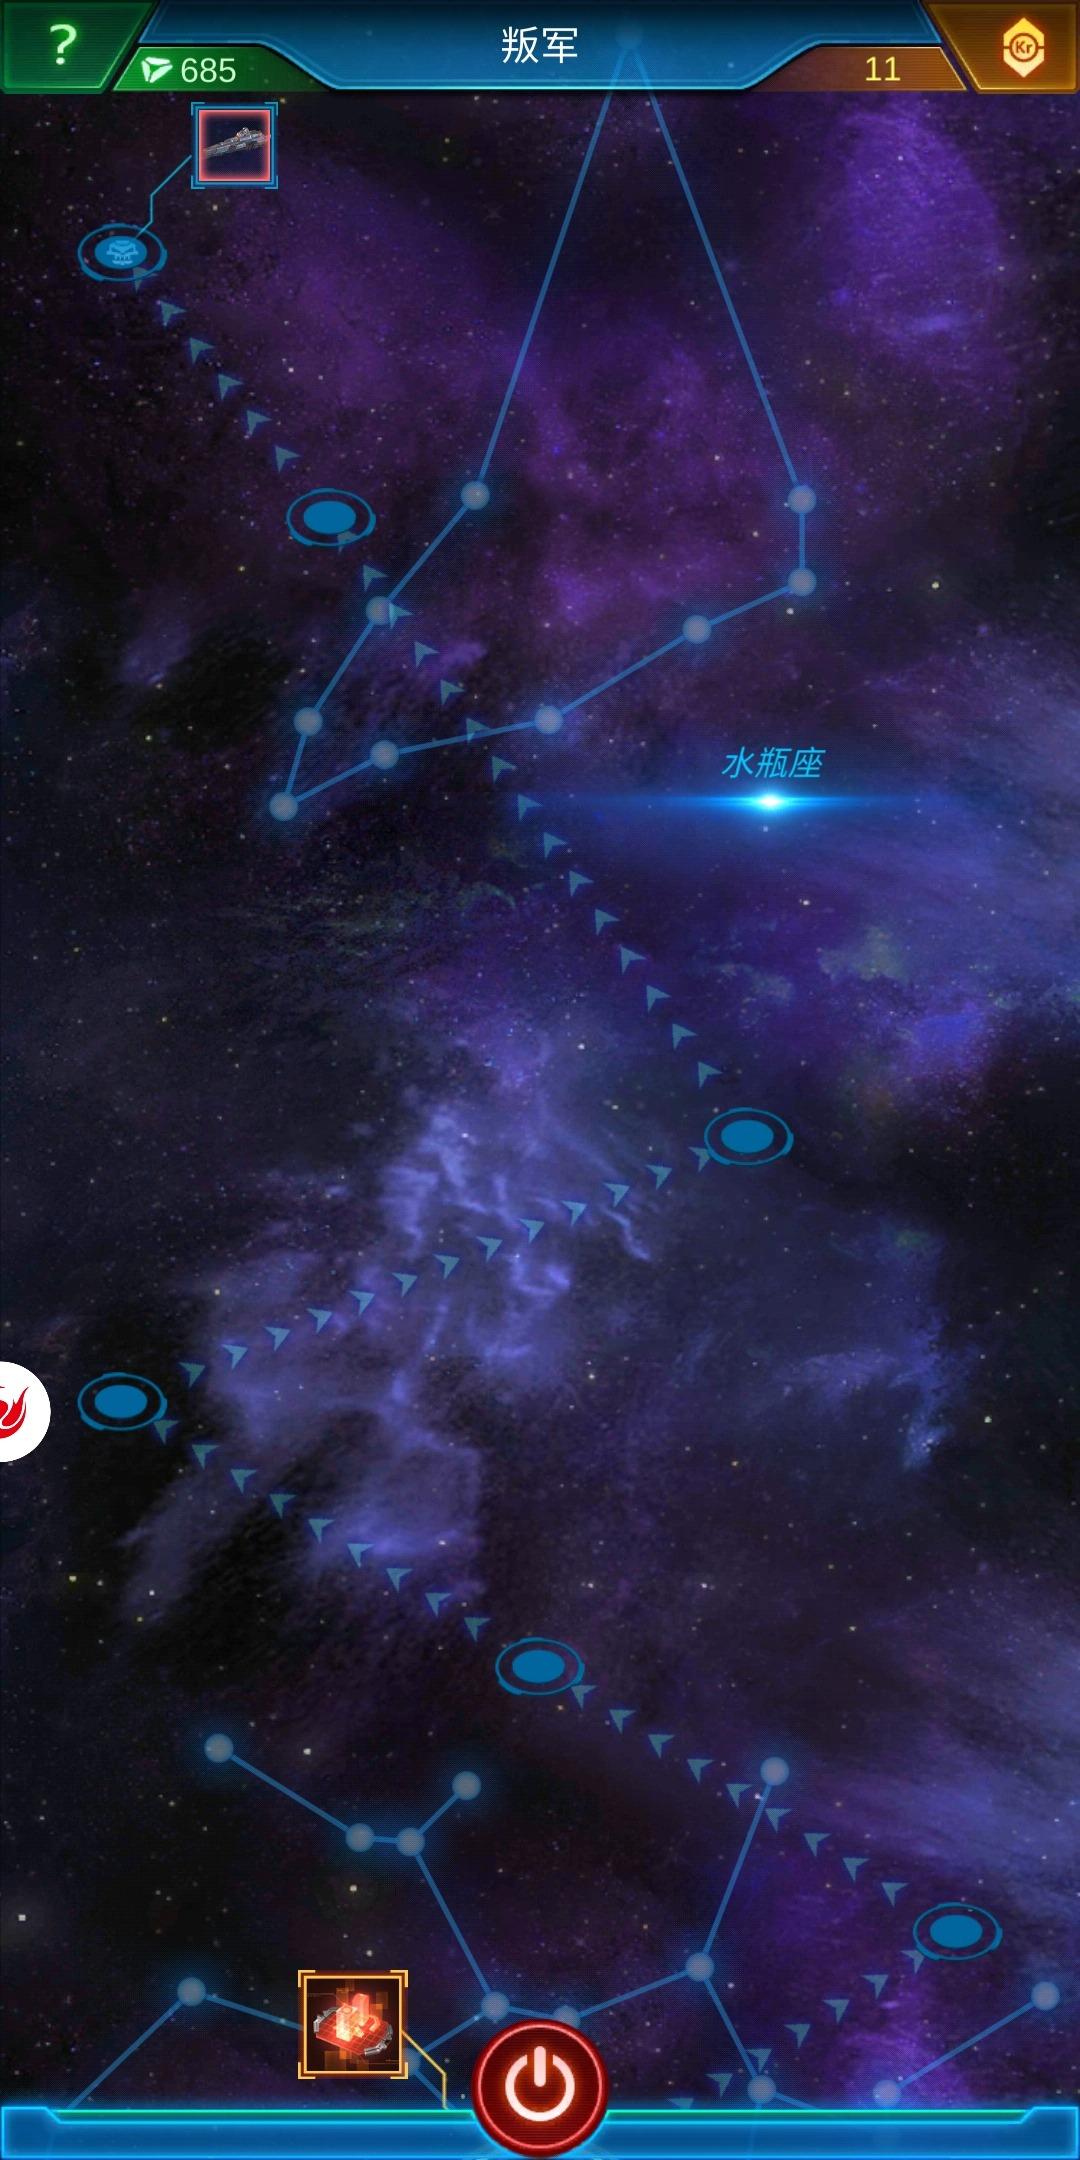 Screenshot_2020-01-10-19-08-20-150_com.jedigames.p16s.luobo.jpg